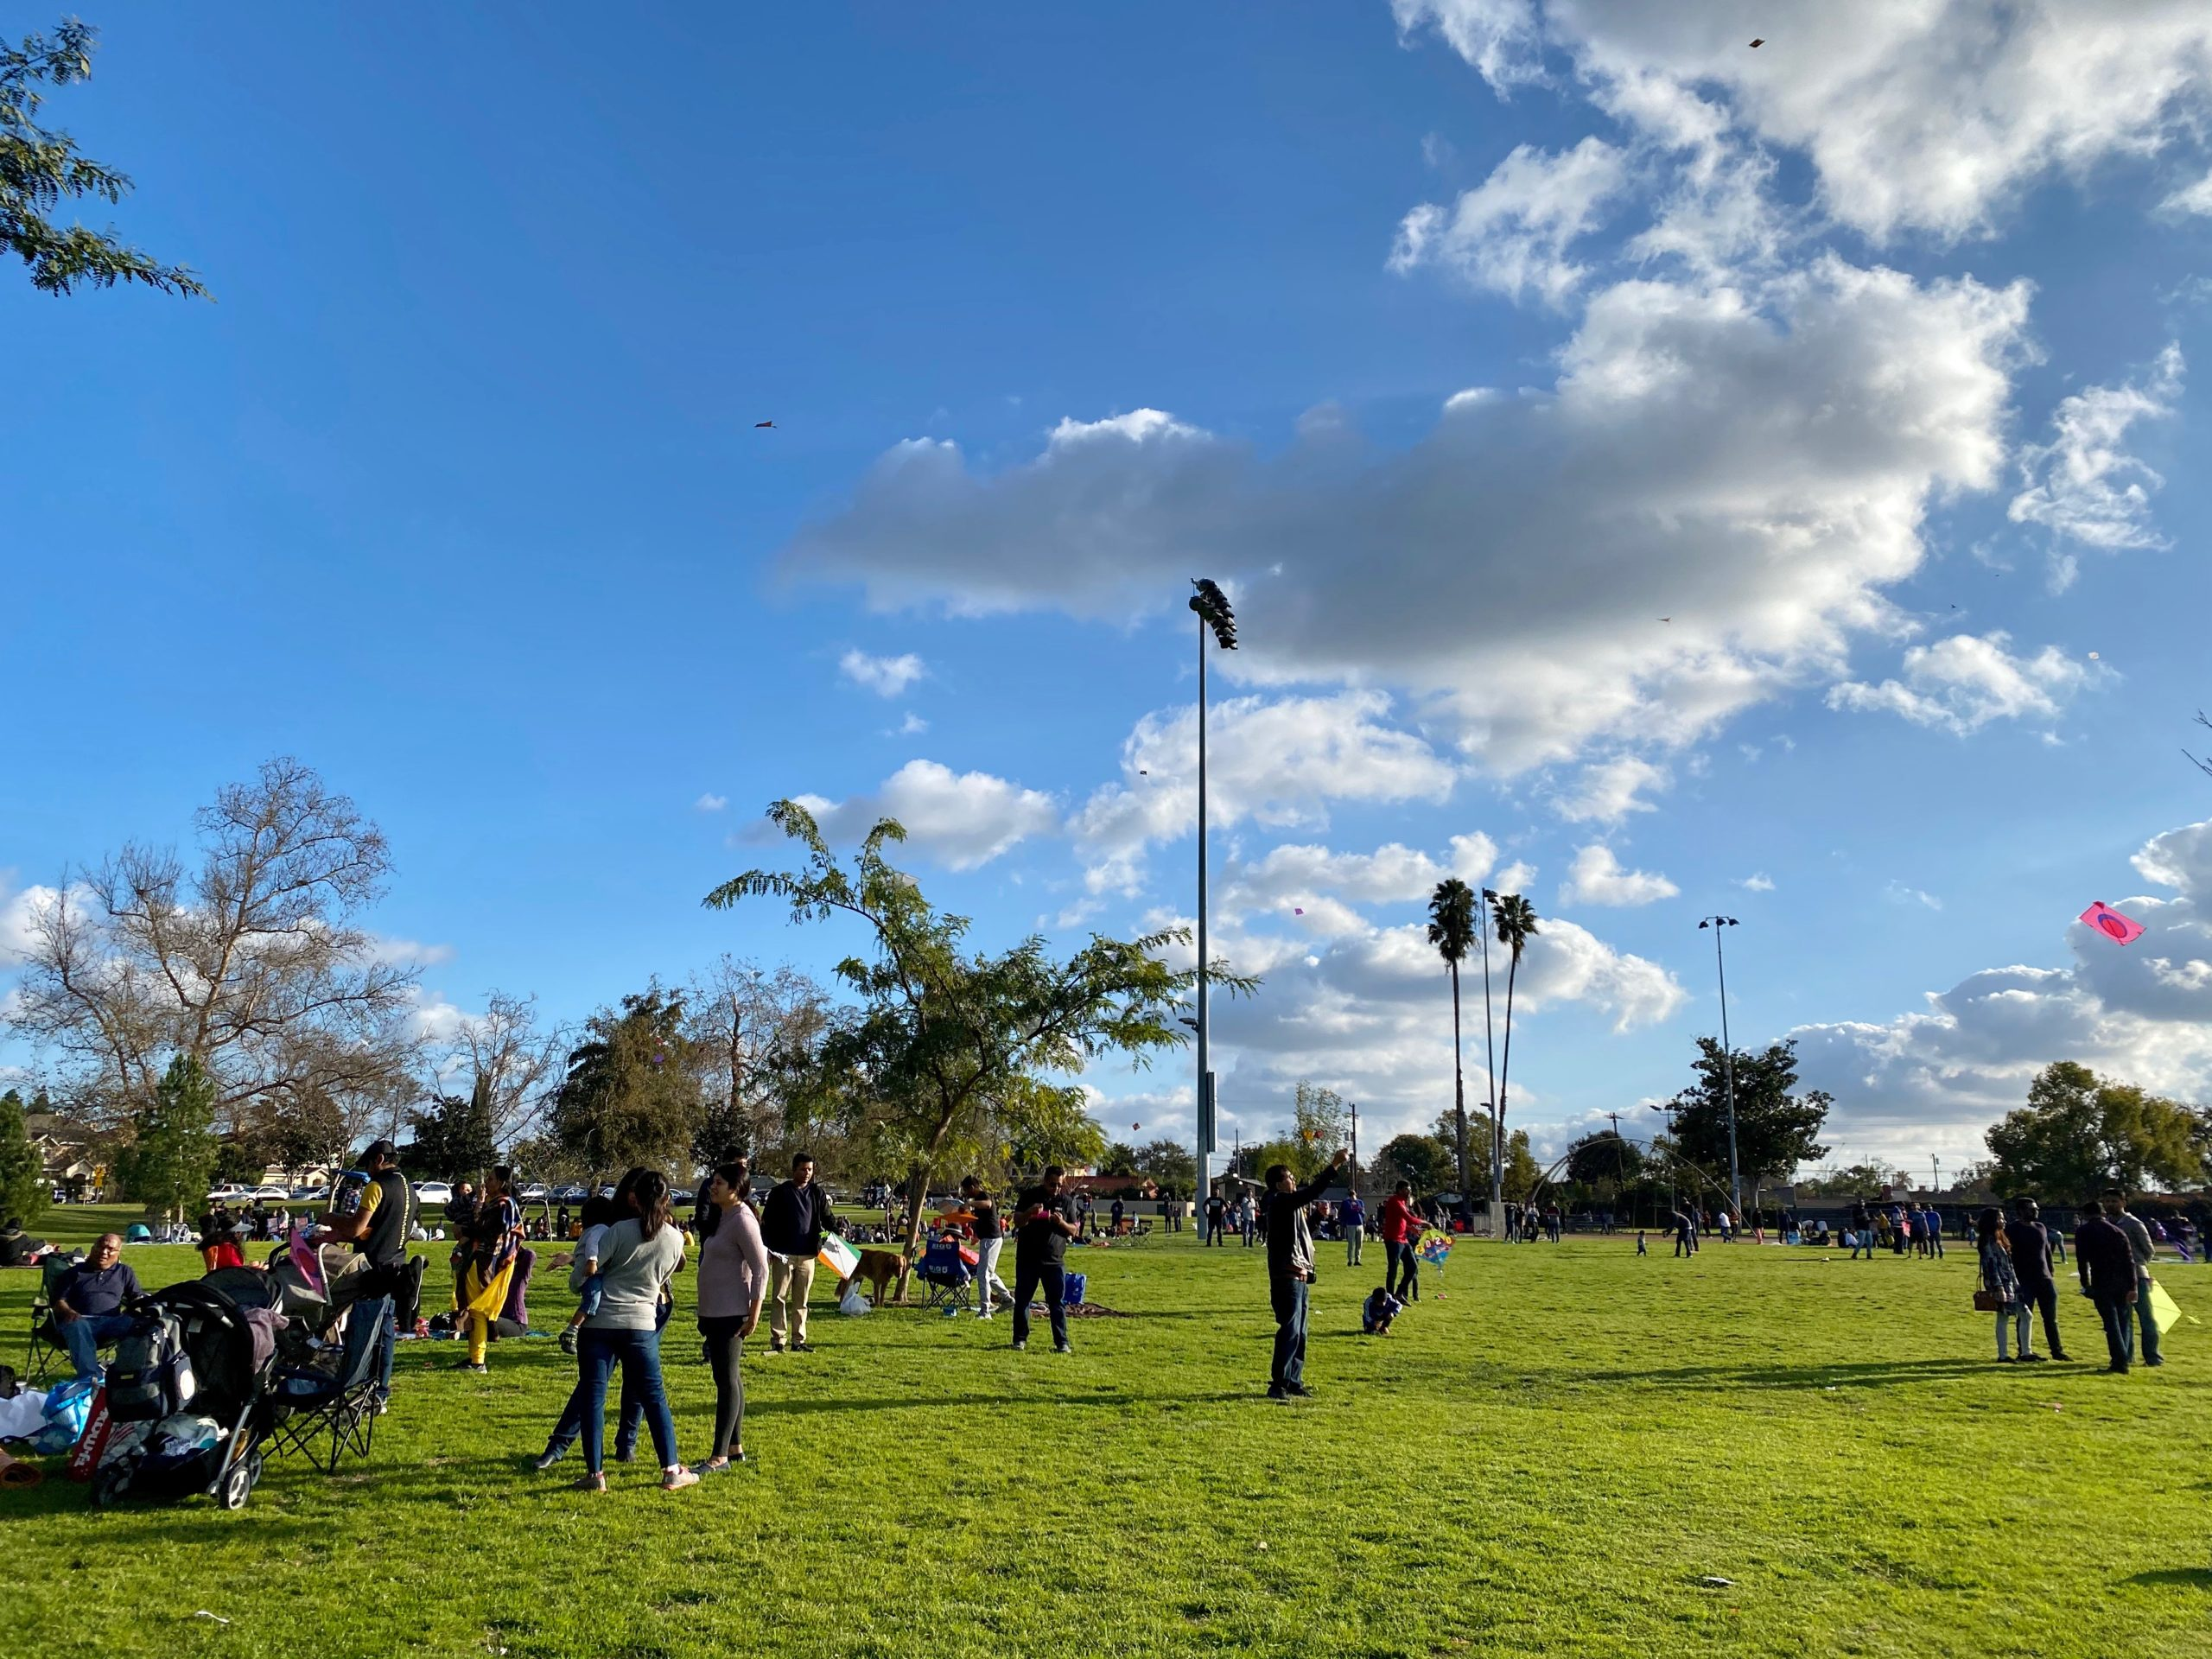 Uttarayan Kite Flying Festival in Los Angeles California